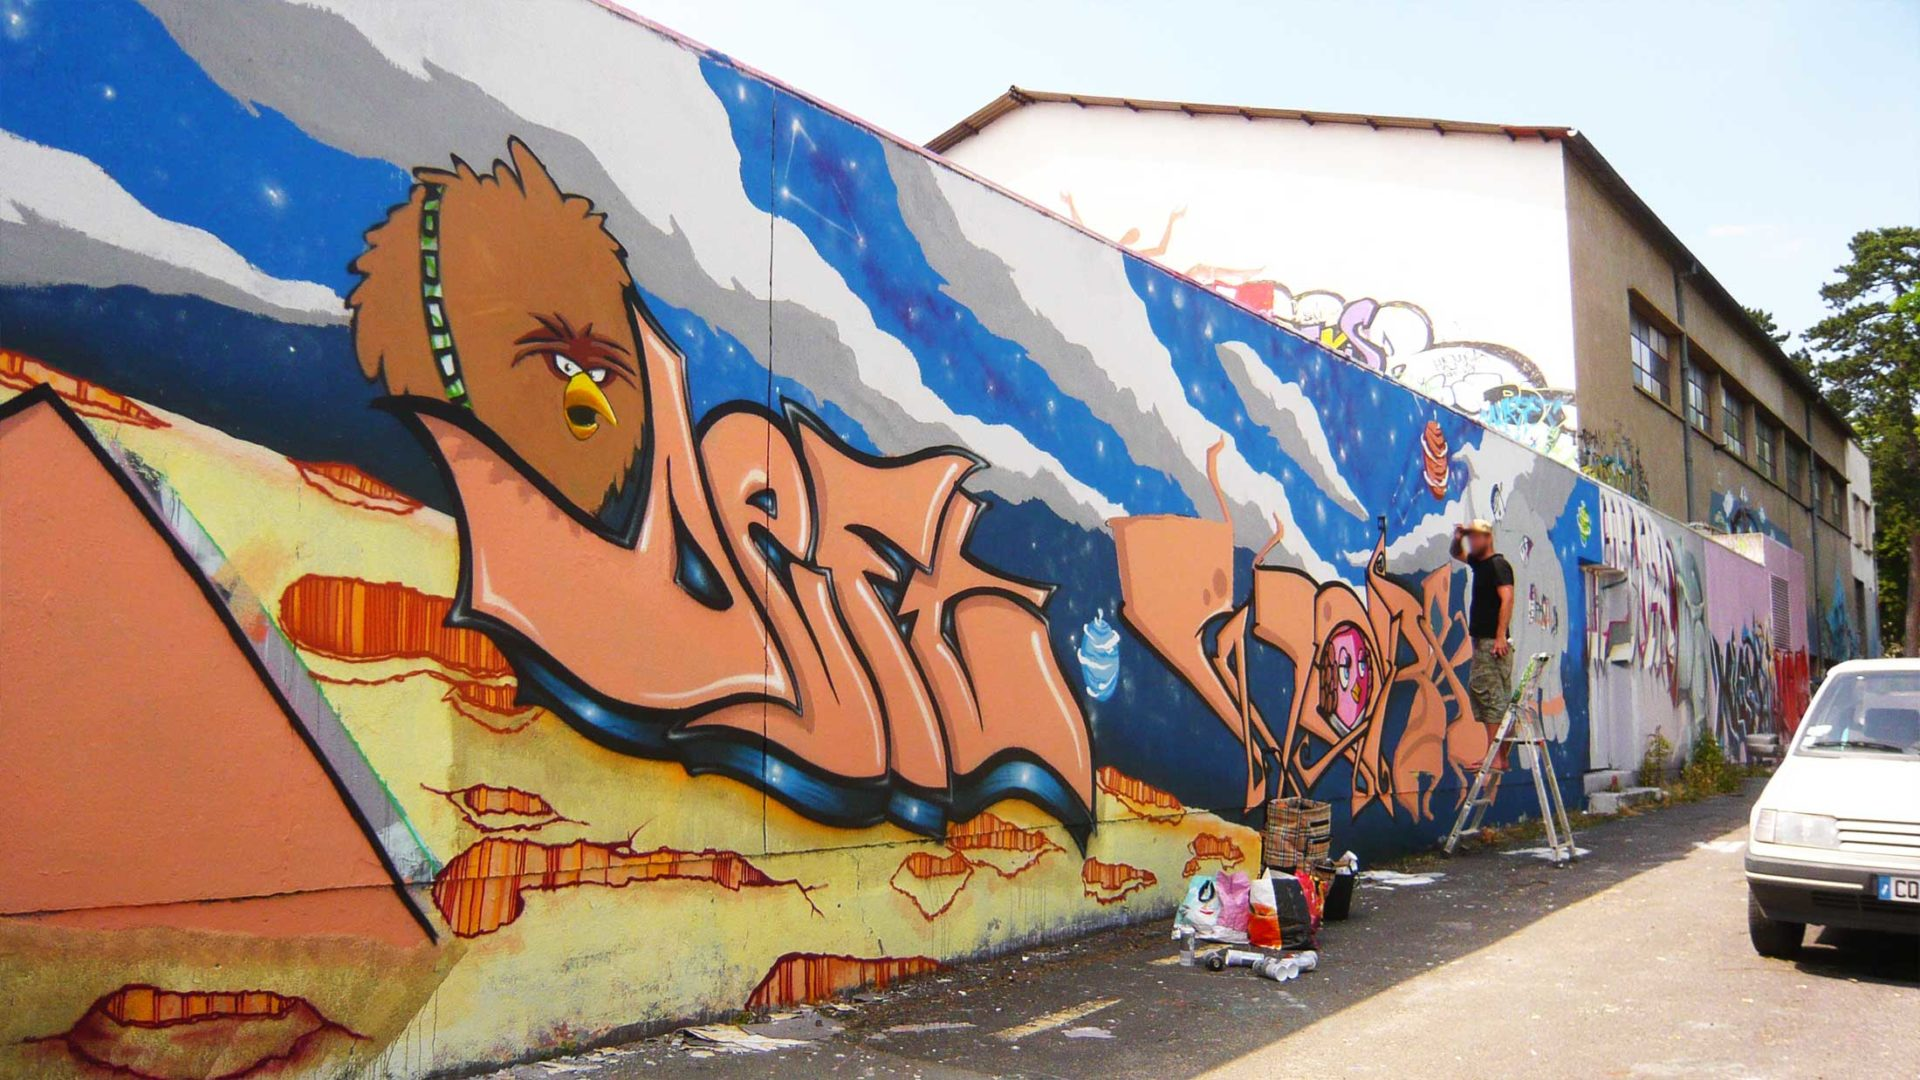 angry-birds-graffiti-1